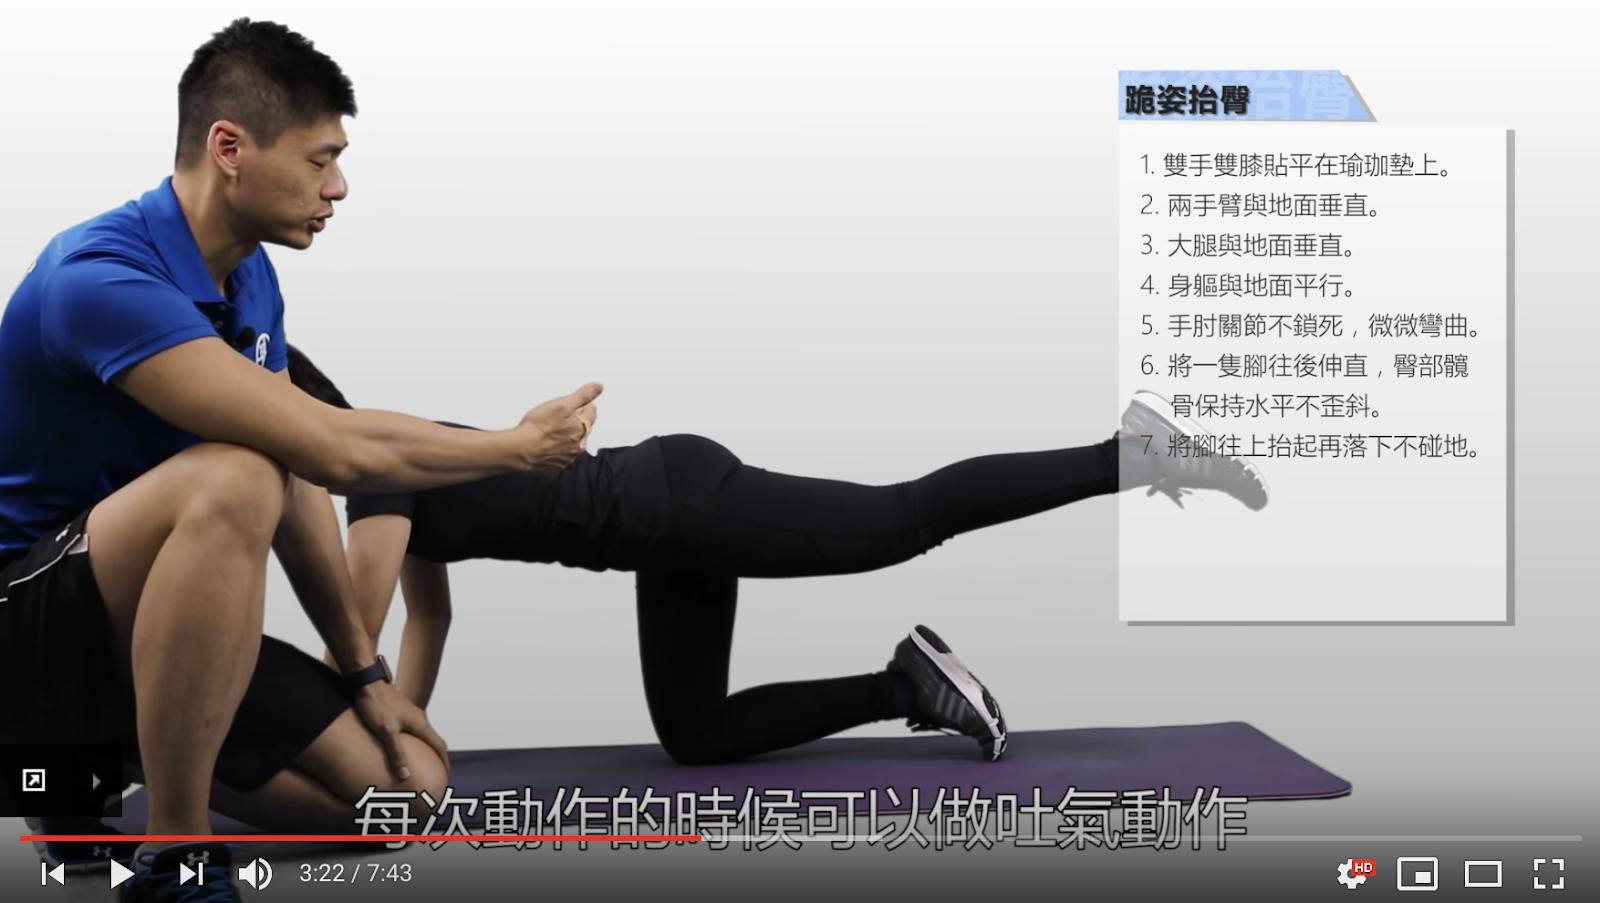 <SuperFIT居家健身菜單>8分鐘翹臀養成運動計畫-跪姿抬臀